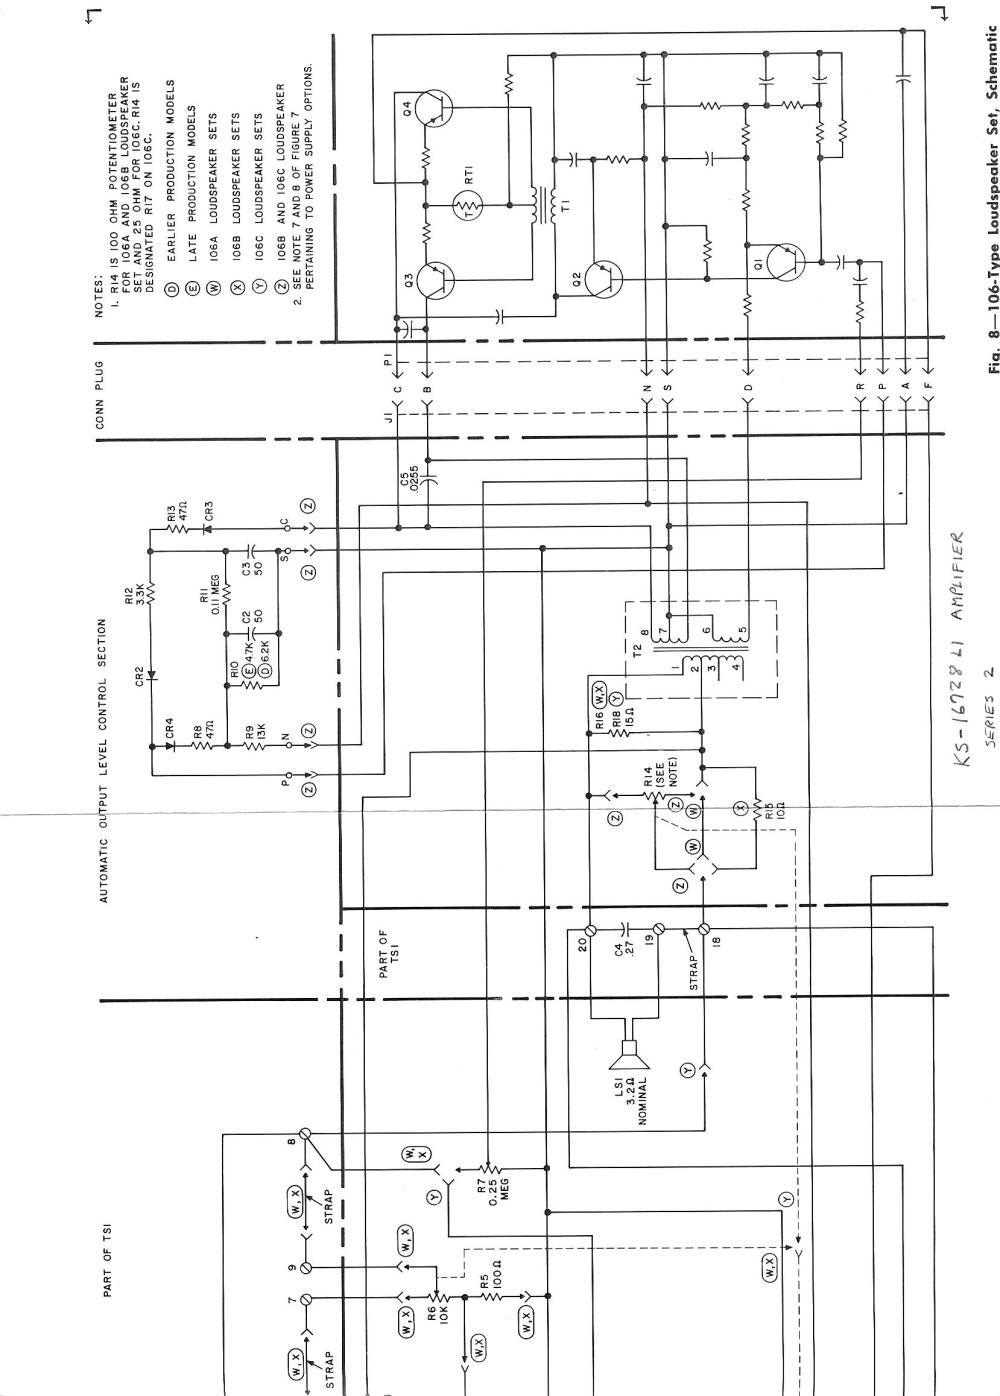 medium resolution of international wiring schematics for stereo get free 1966 international truck wiring diagrams 2000 international 4900 dt466e wiring schematic